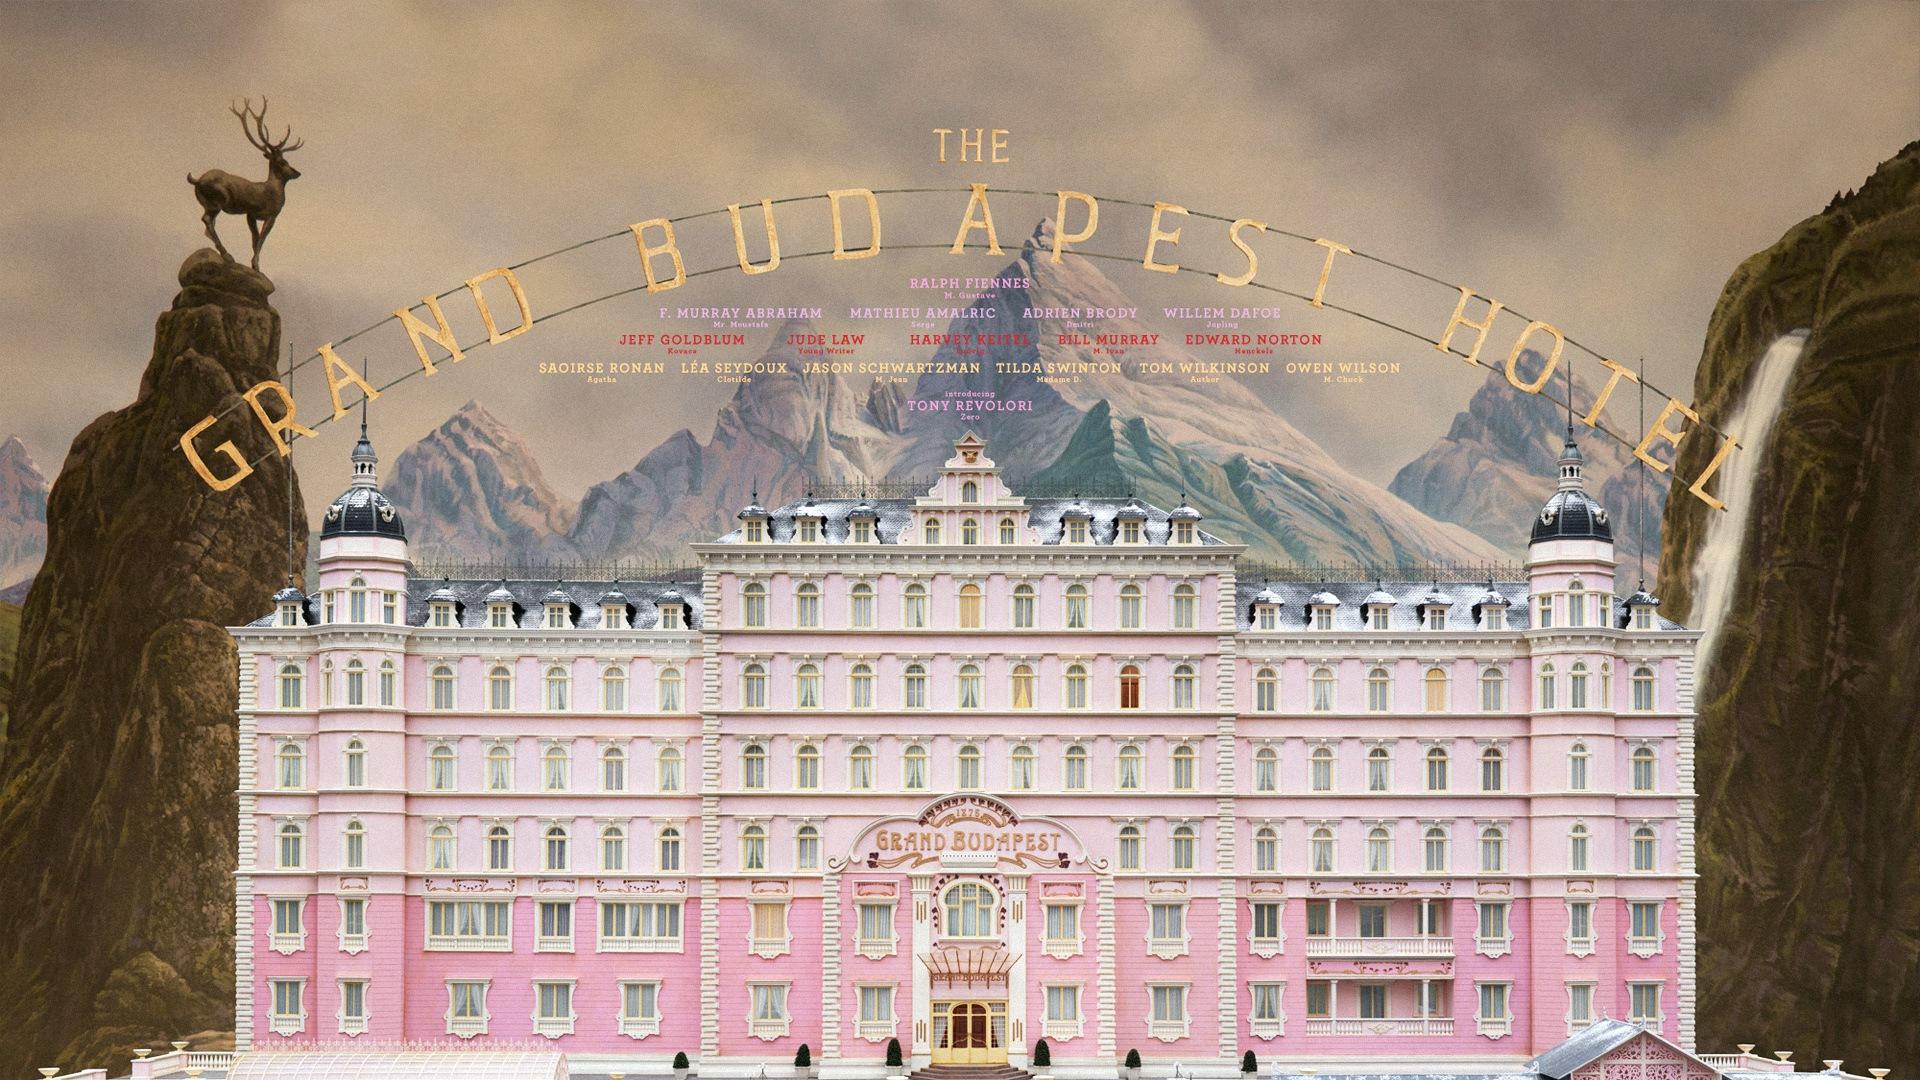 1920x1080-the-grand-budapest-hotel-gustave-henckels-ralph-fiennes-edward-norton-wallpaper-wp360913